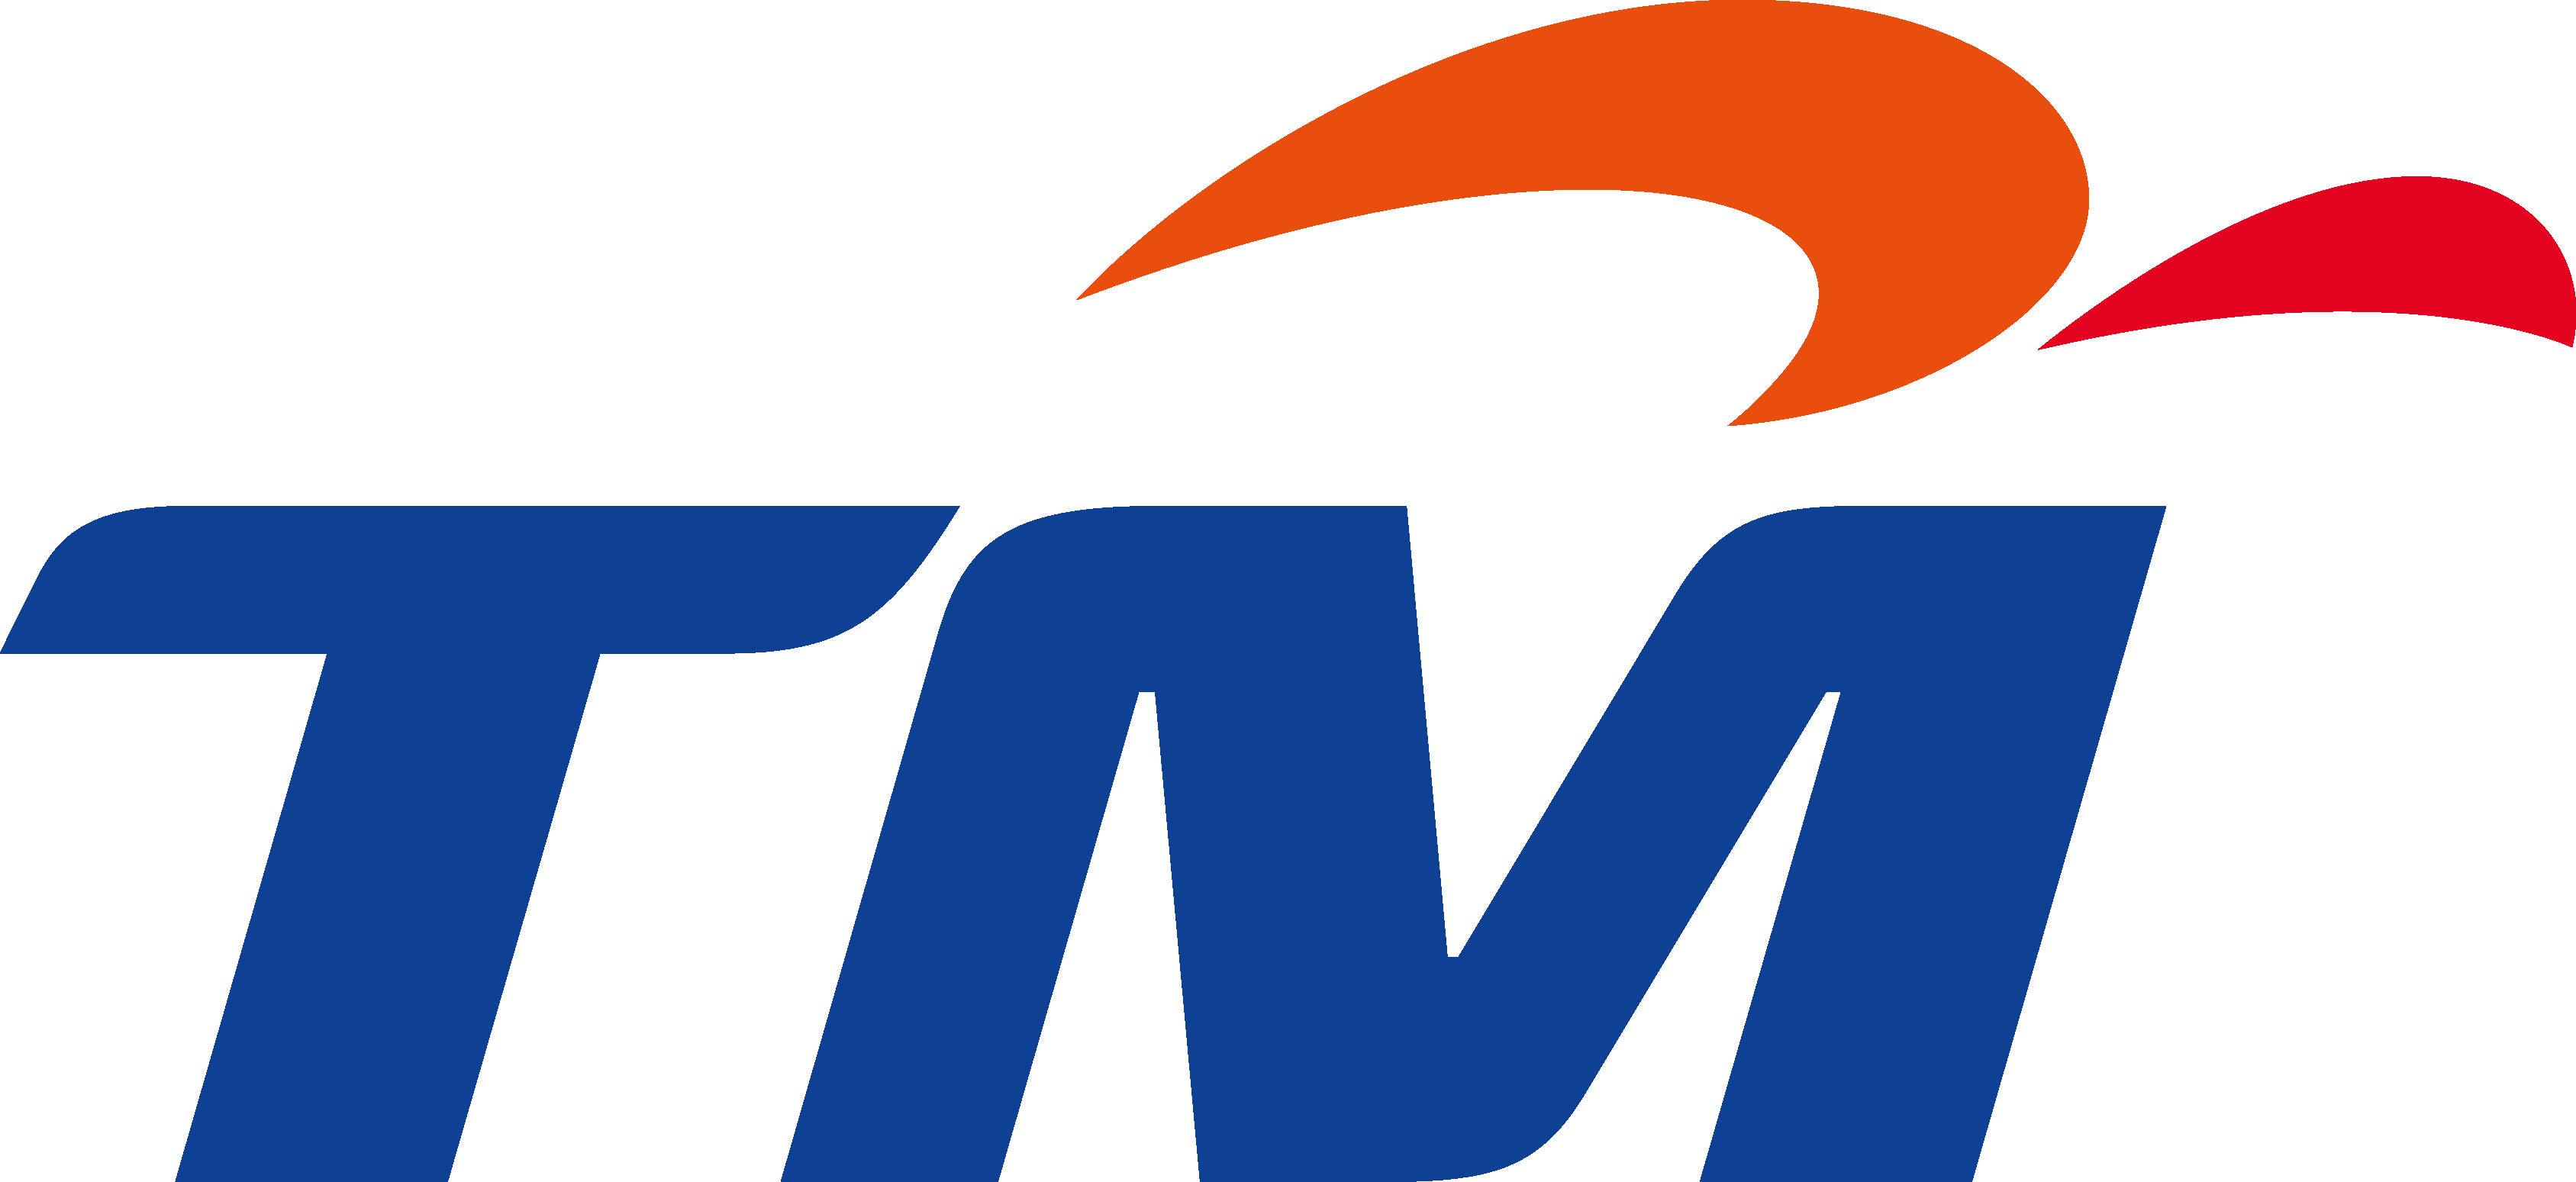 Tm Logo Telekom Malaysia Tm Com My Png Image Tm Logo Logos Corporate Shirts